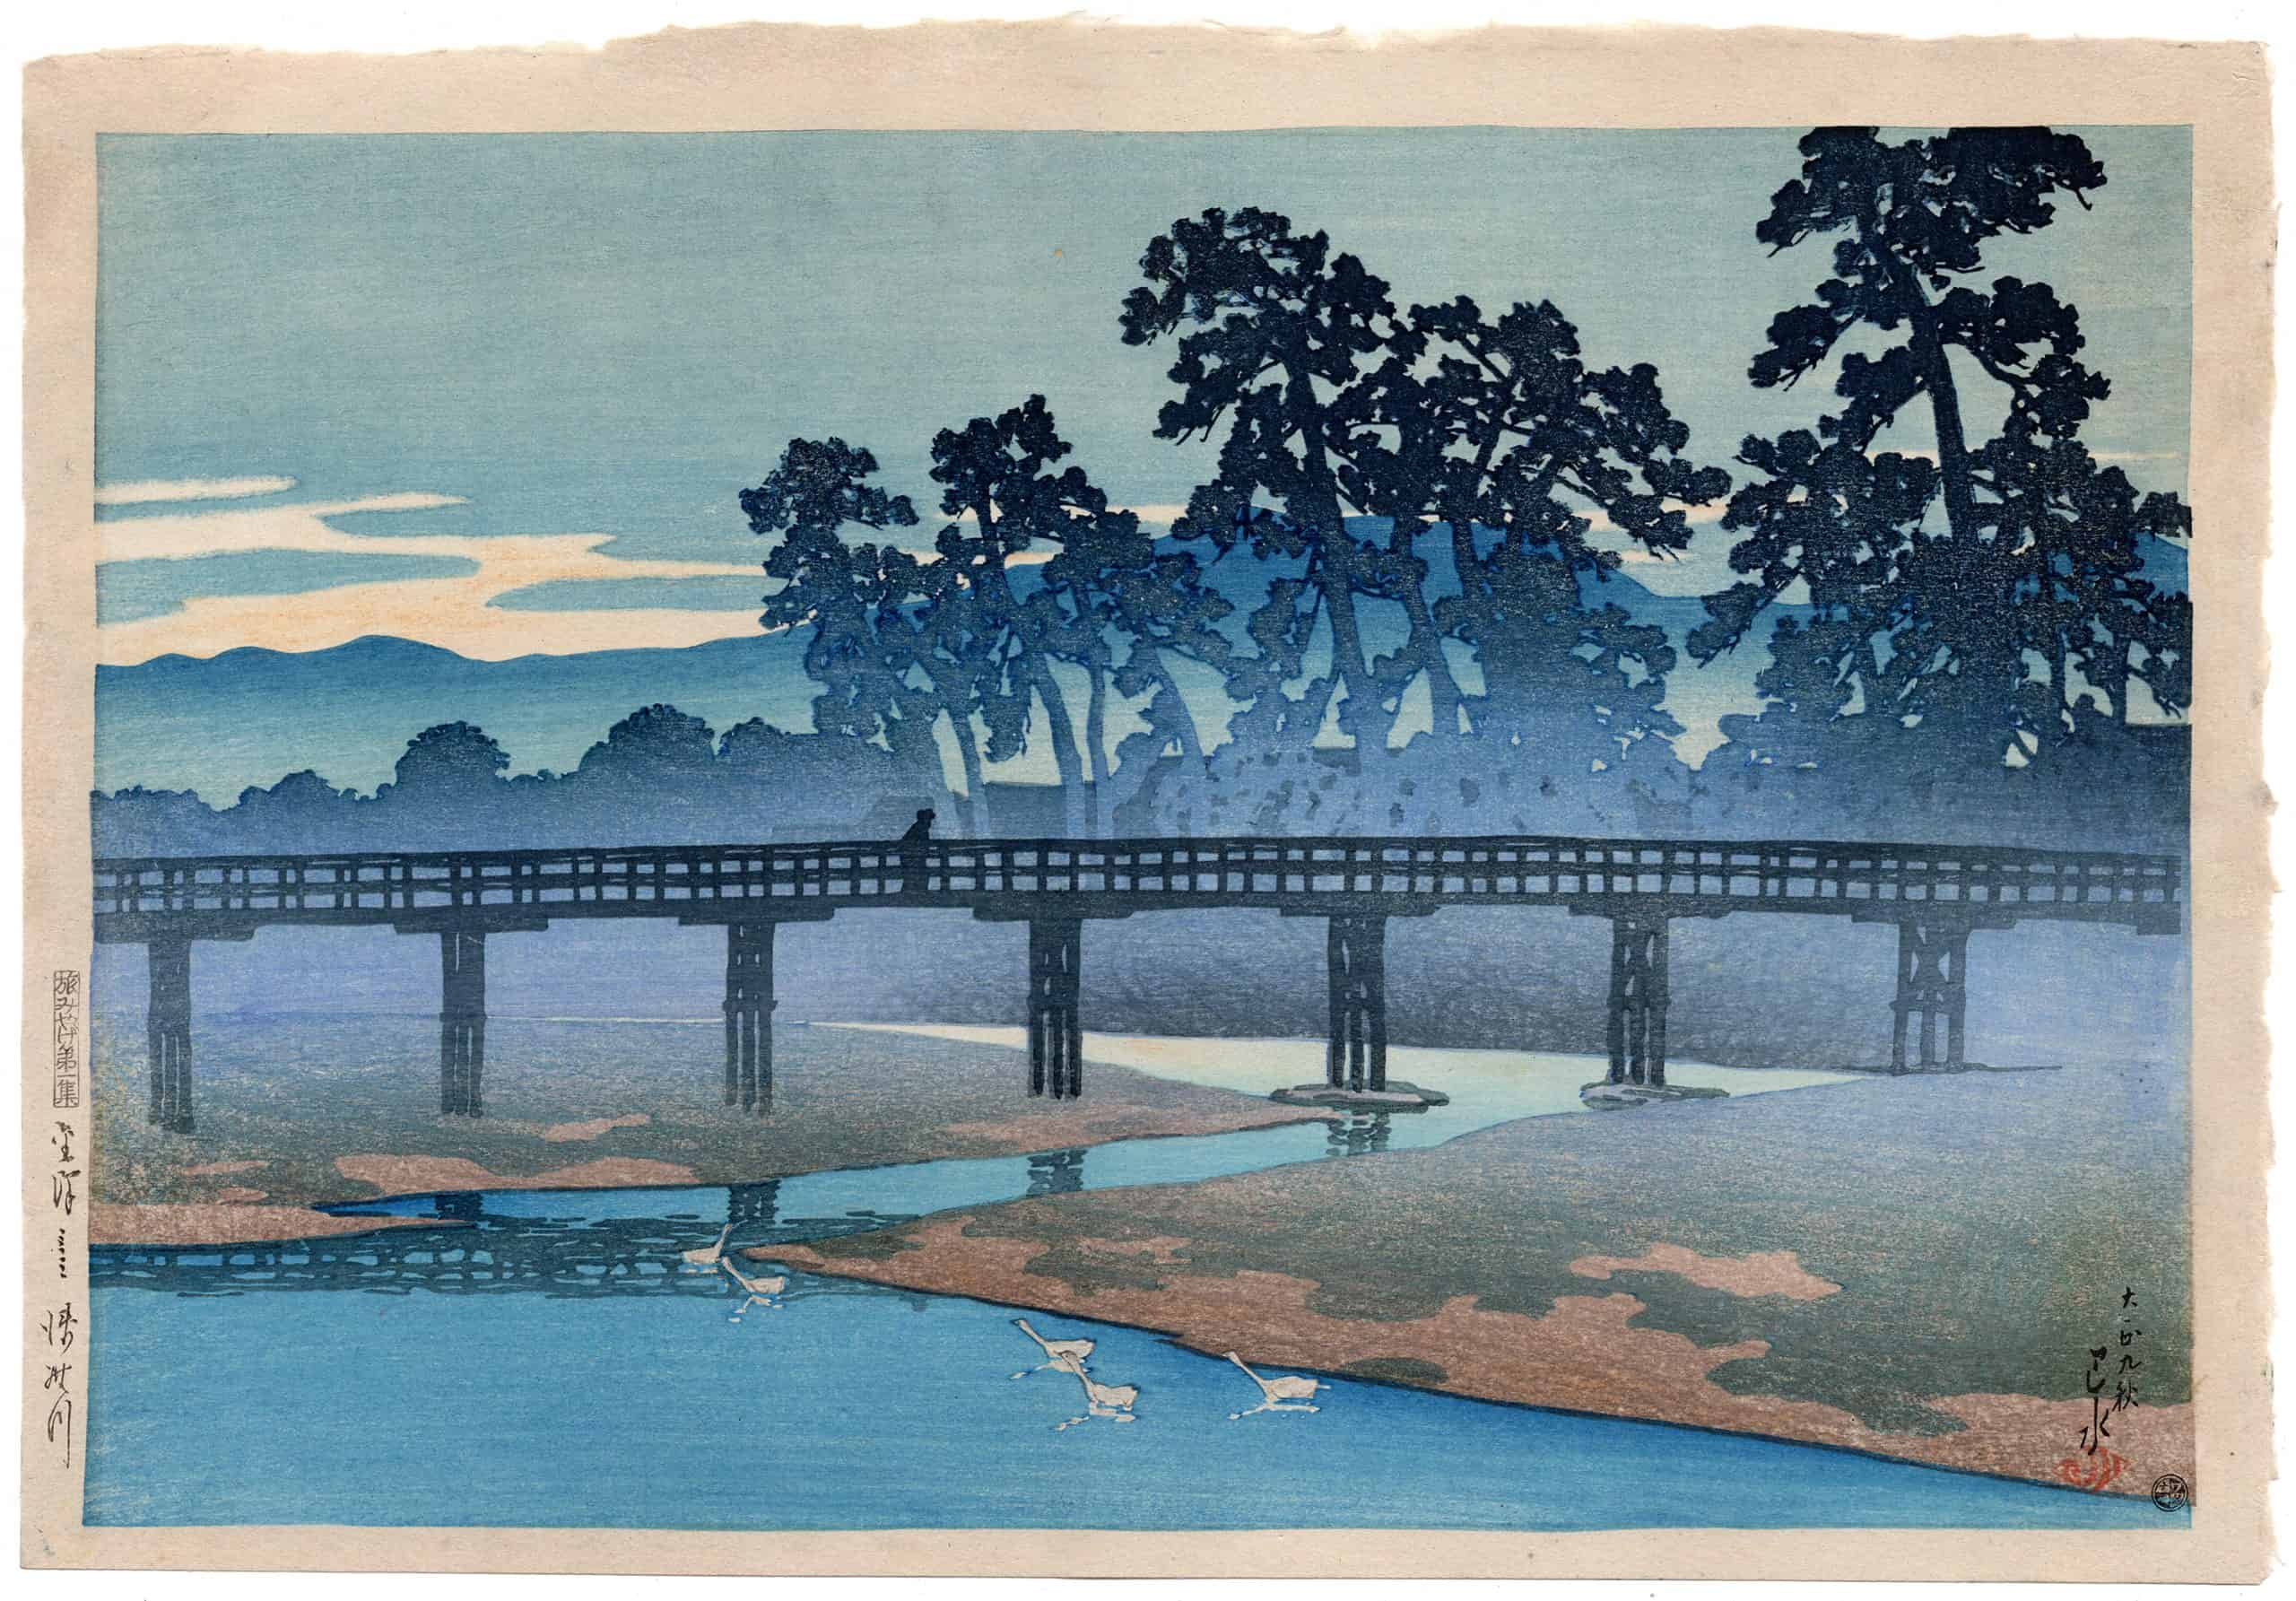 Kawase Hasui - Asano River in Kanazawa (Pre-Earthquake)